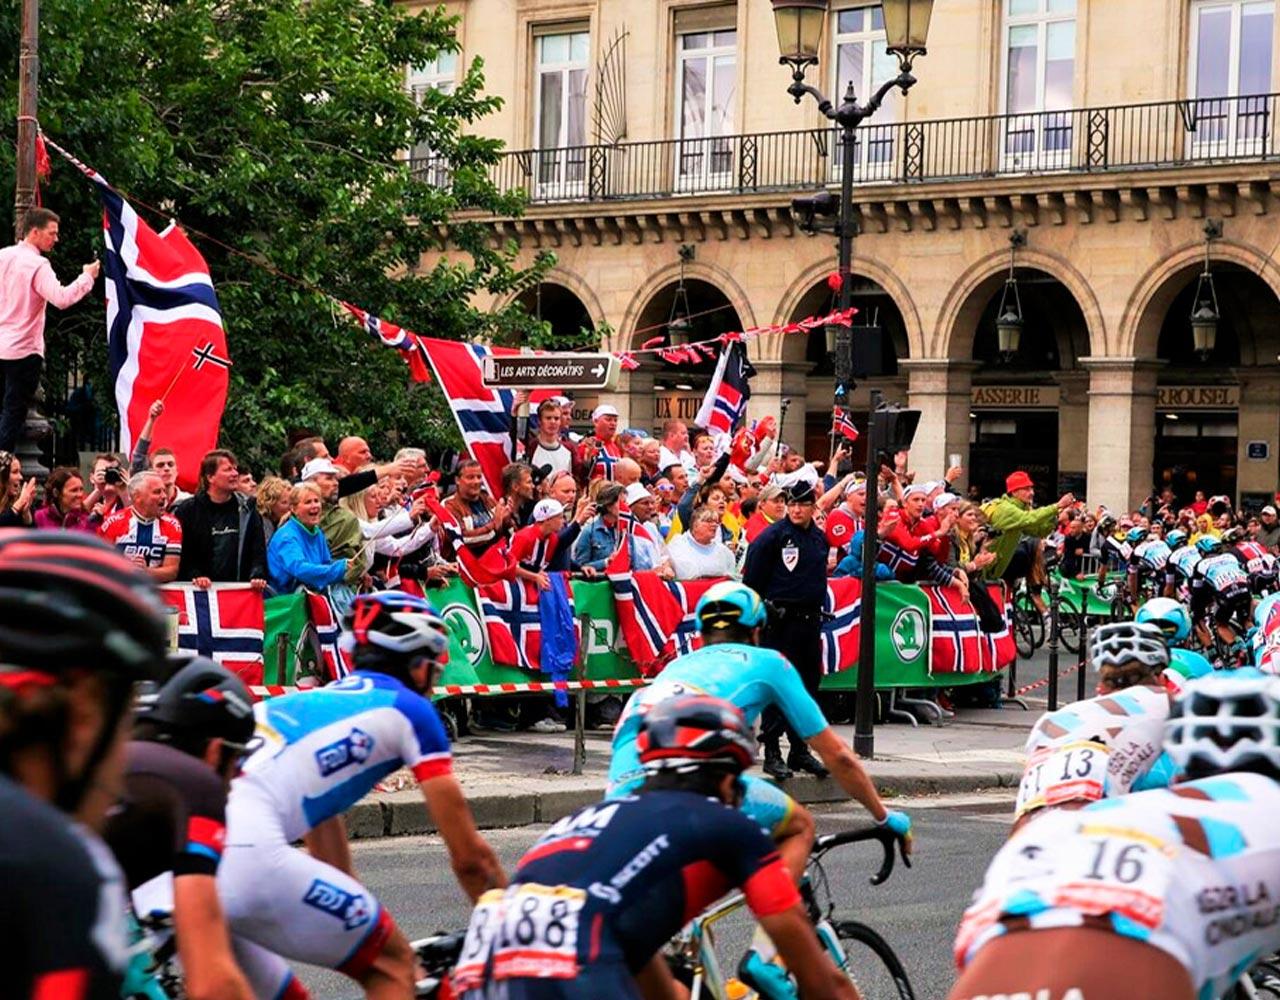 Tour de france, sykkel, maxpulse, reise, sykkelreise, TdF